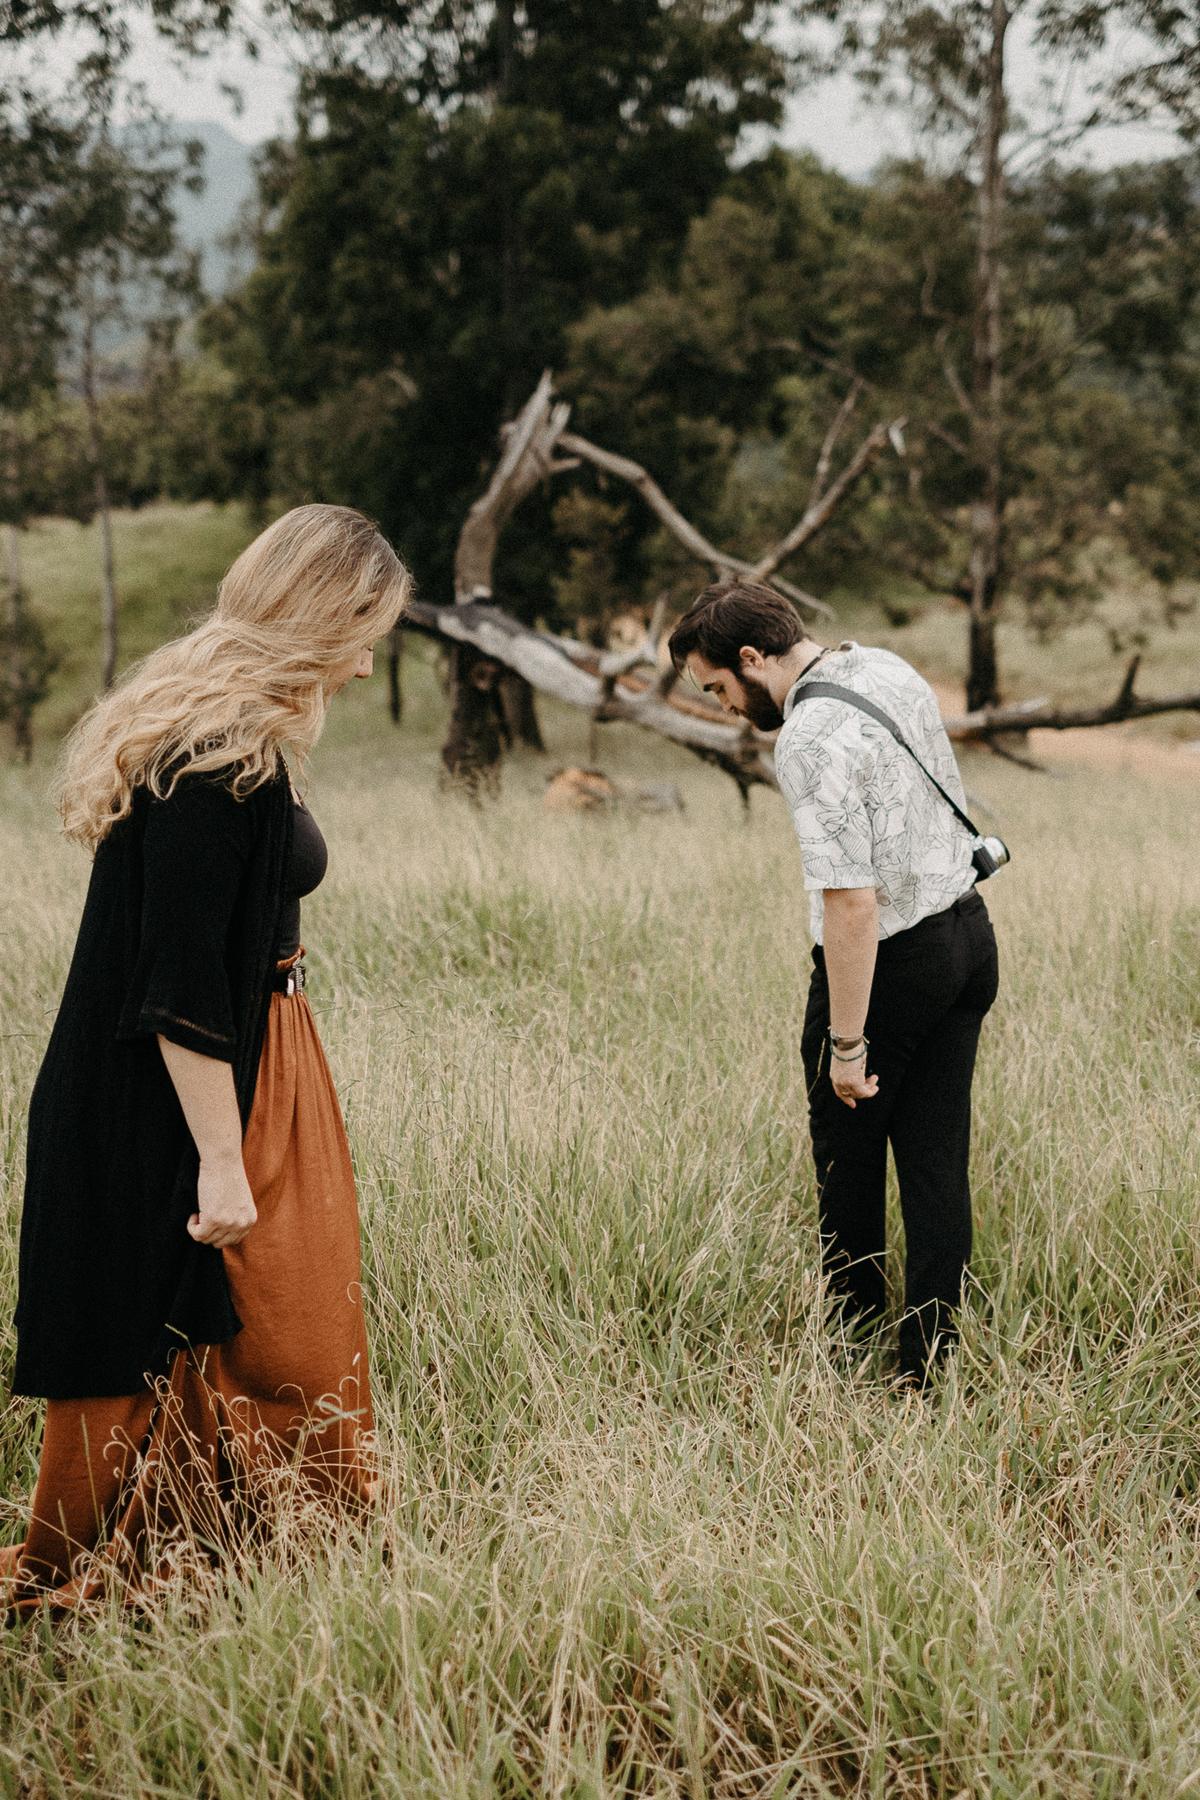 ensaio pre casamento ensaio autoral noivos artistas elopement pirapora do bom jesus por caio henrique  casar no campo ensaios intimistas